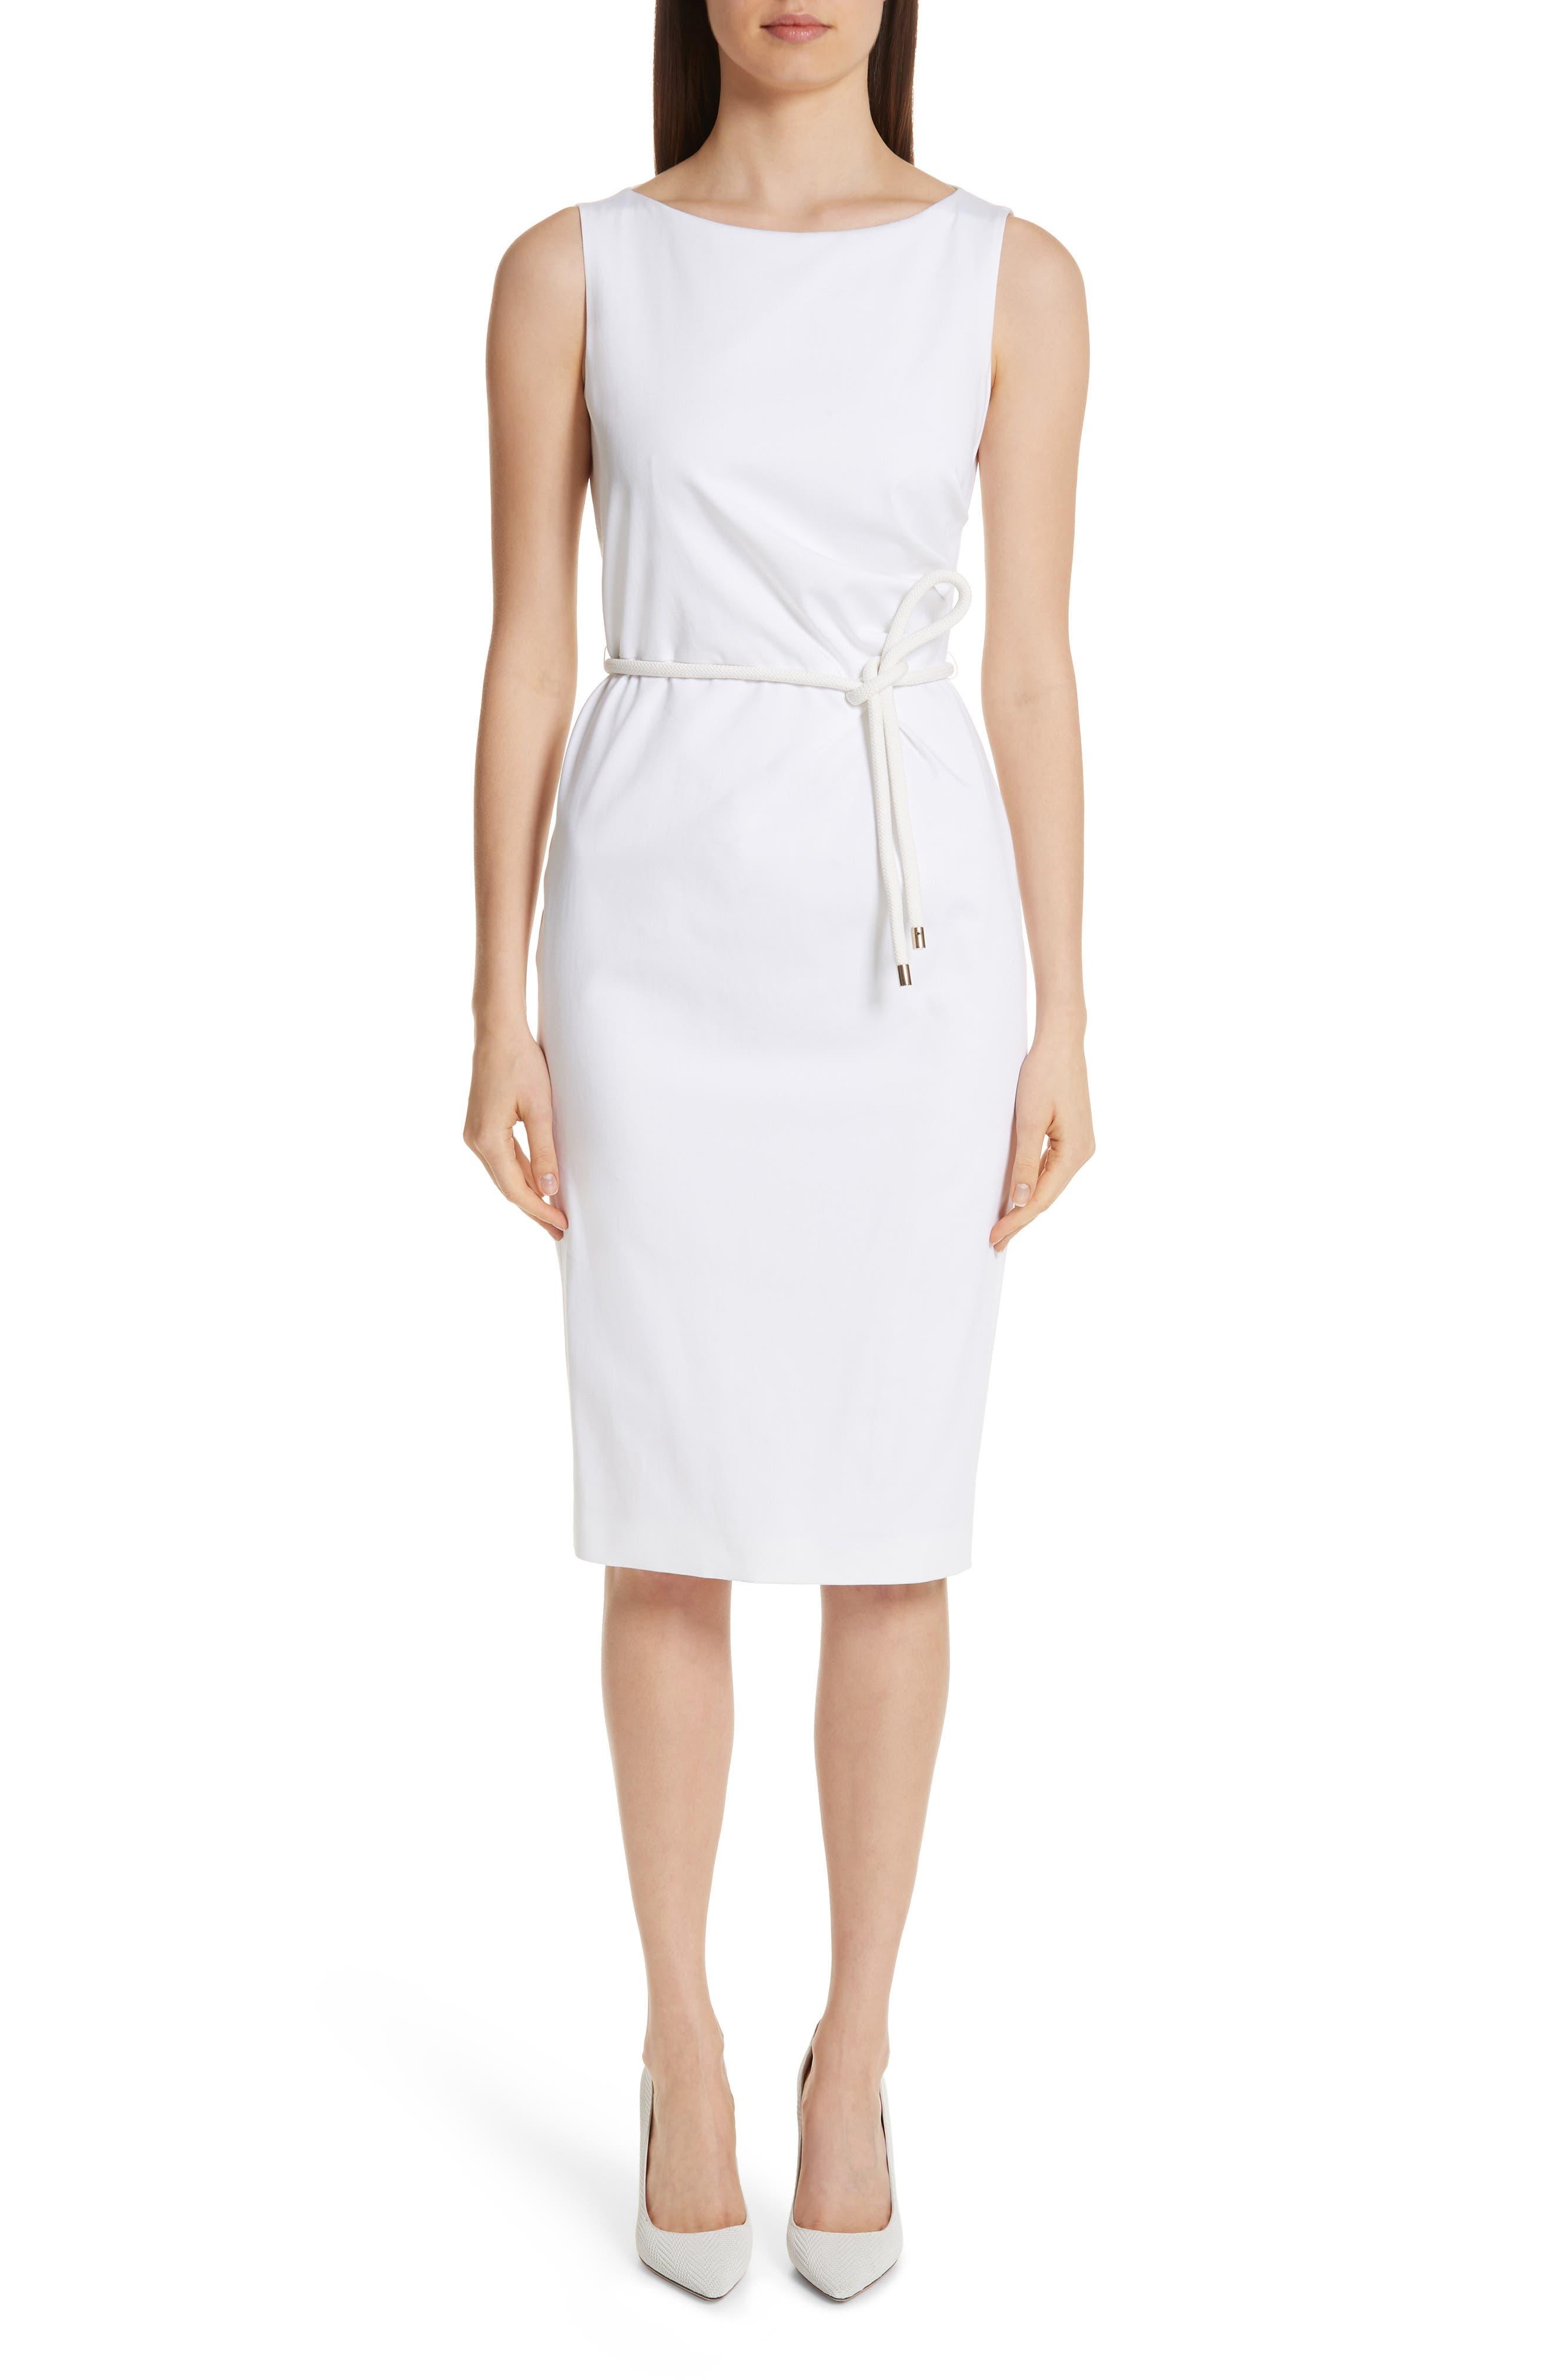 MAX MARA, Cordoba Sheath Dress, Main thumbnail 1, color, OPTICAL WHITE